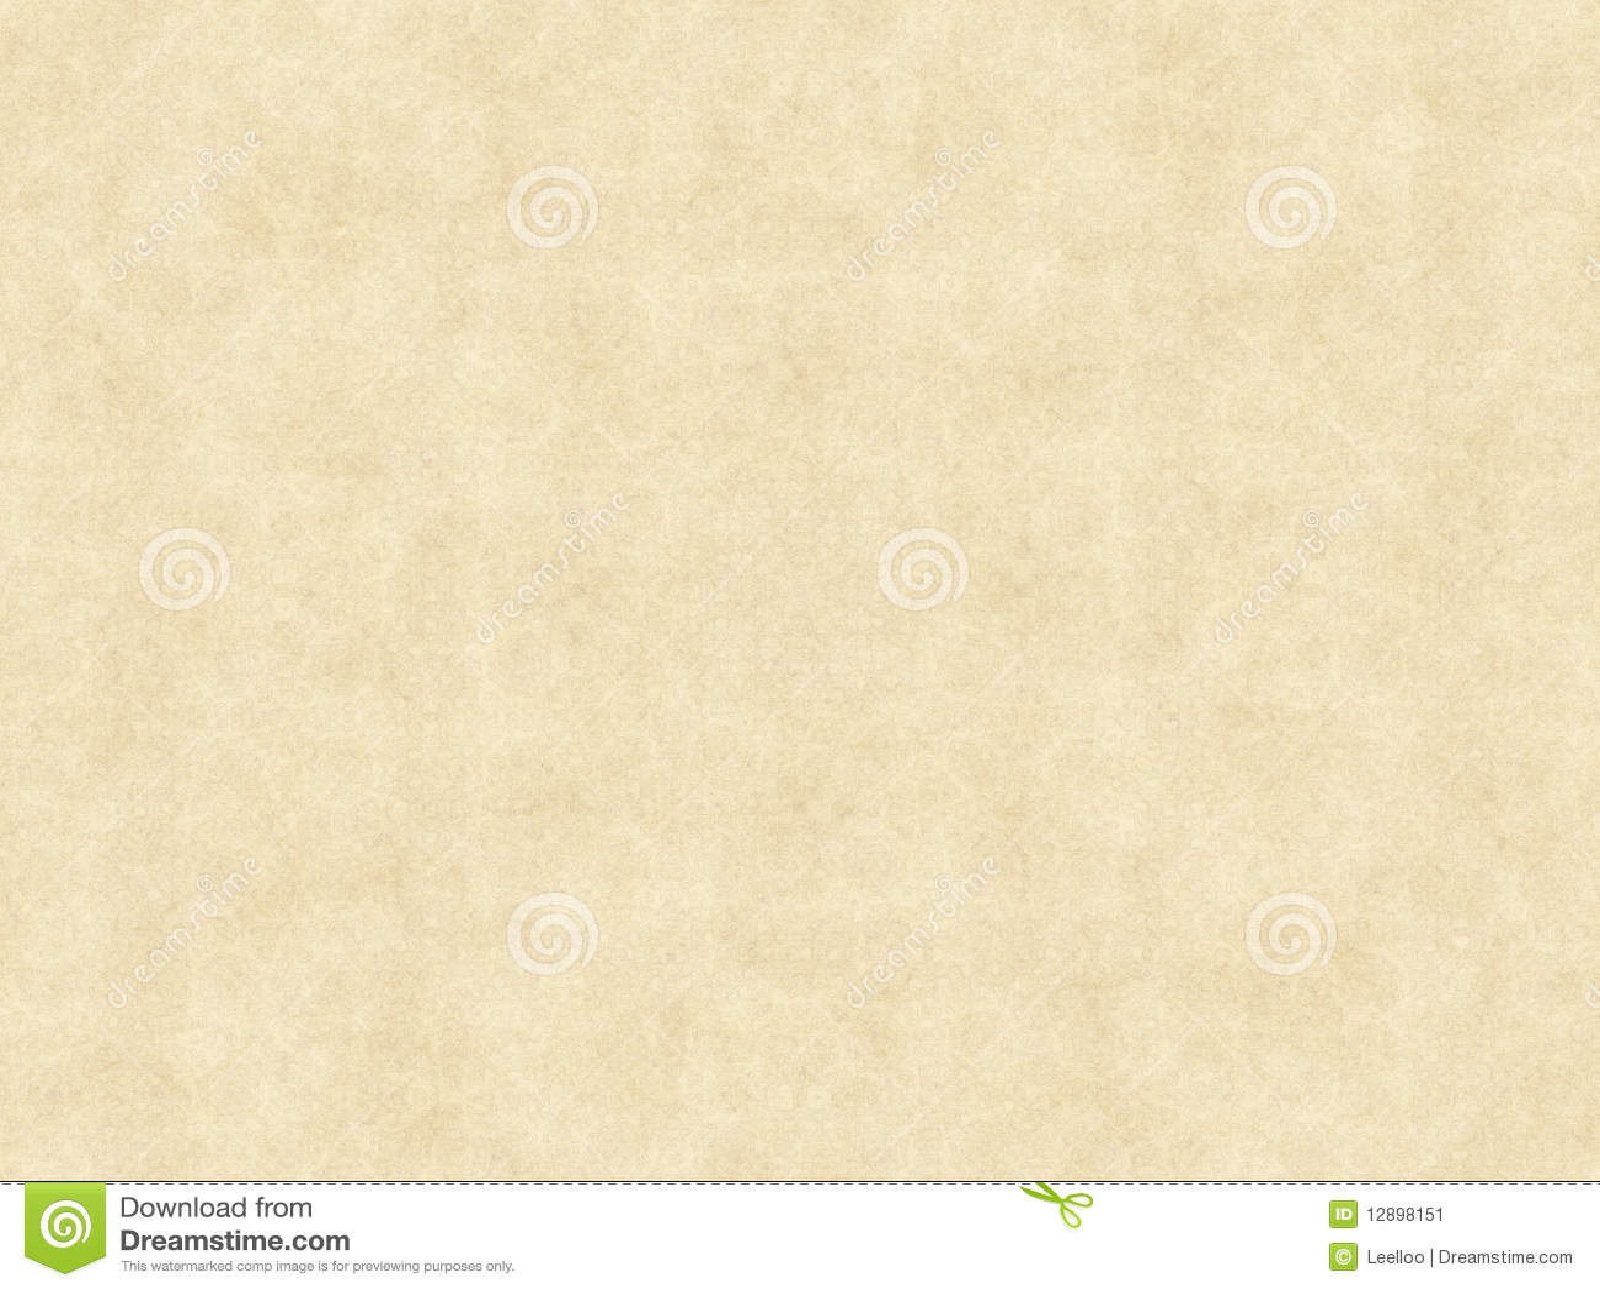 Elegant Old Paper Background Texture Stock Illustration